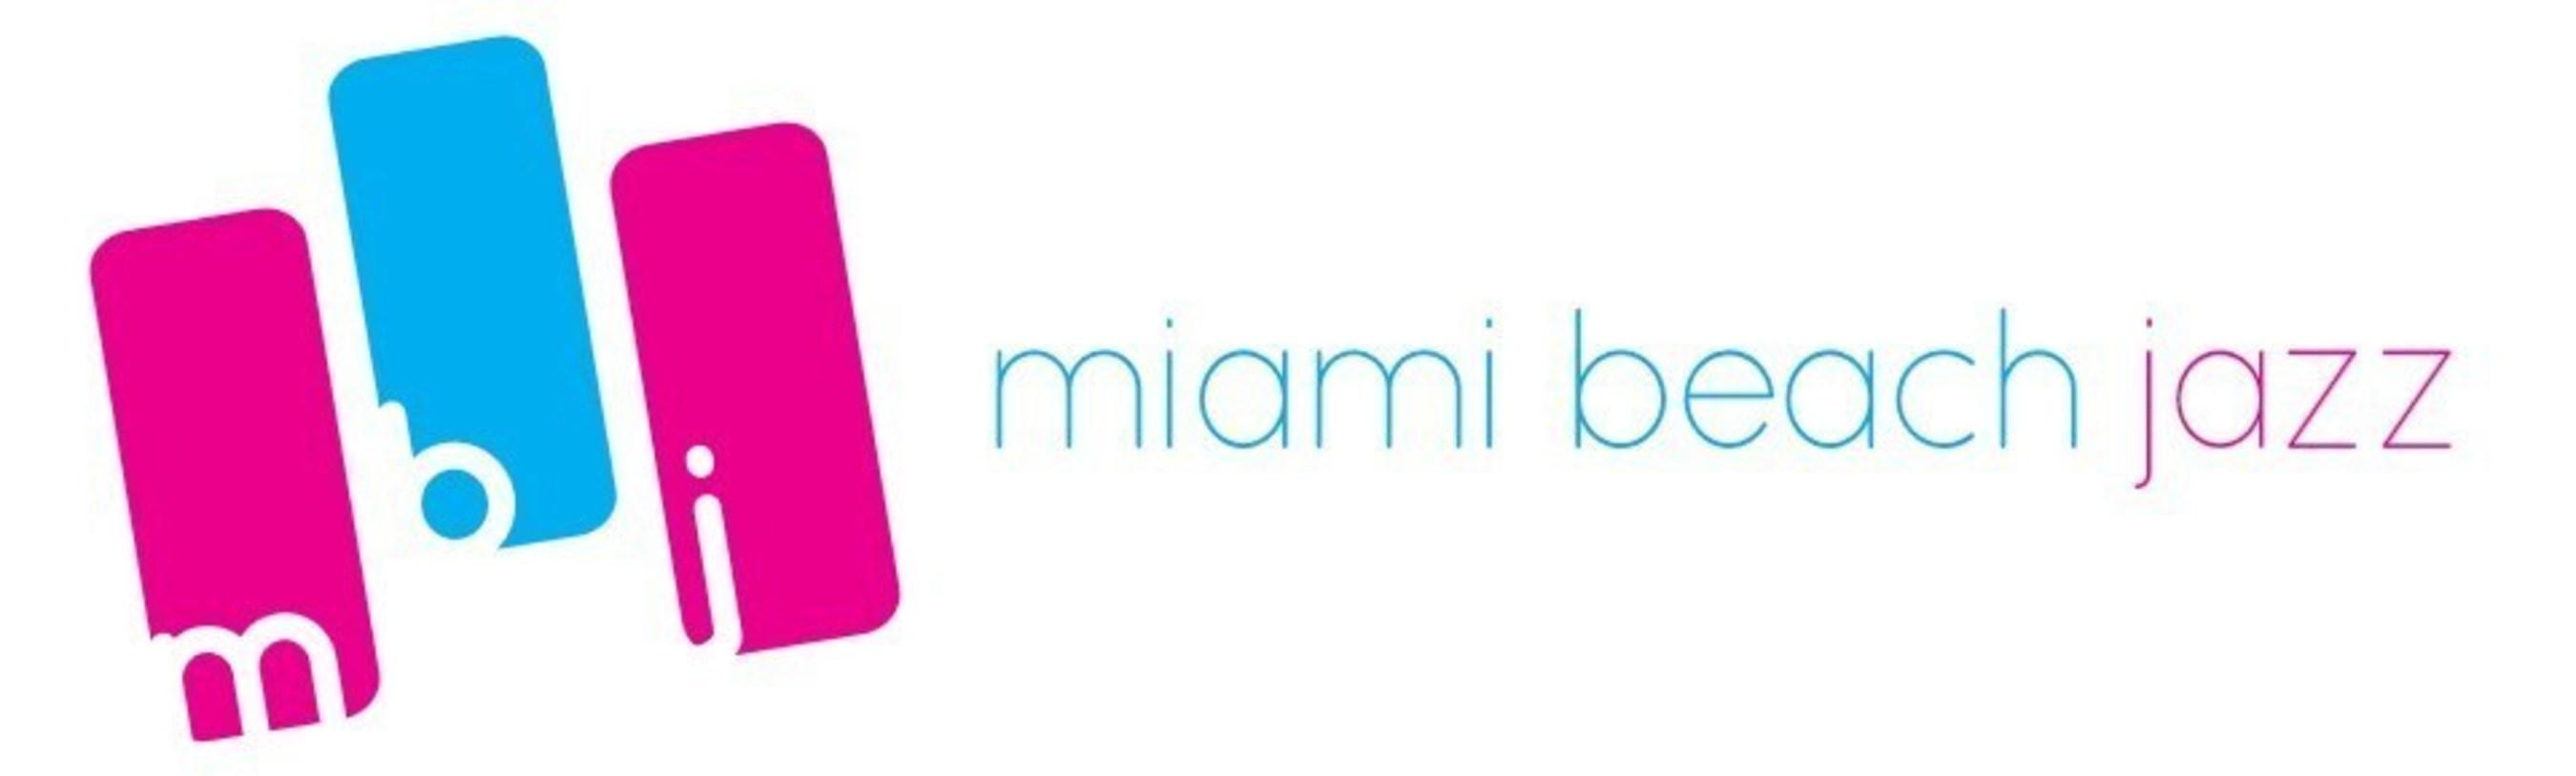 The 3rd Annual Miami Beach Jazz Festival, 'International Sound of Jazz'